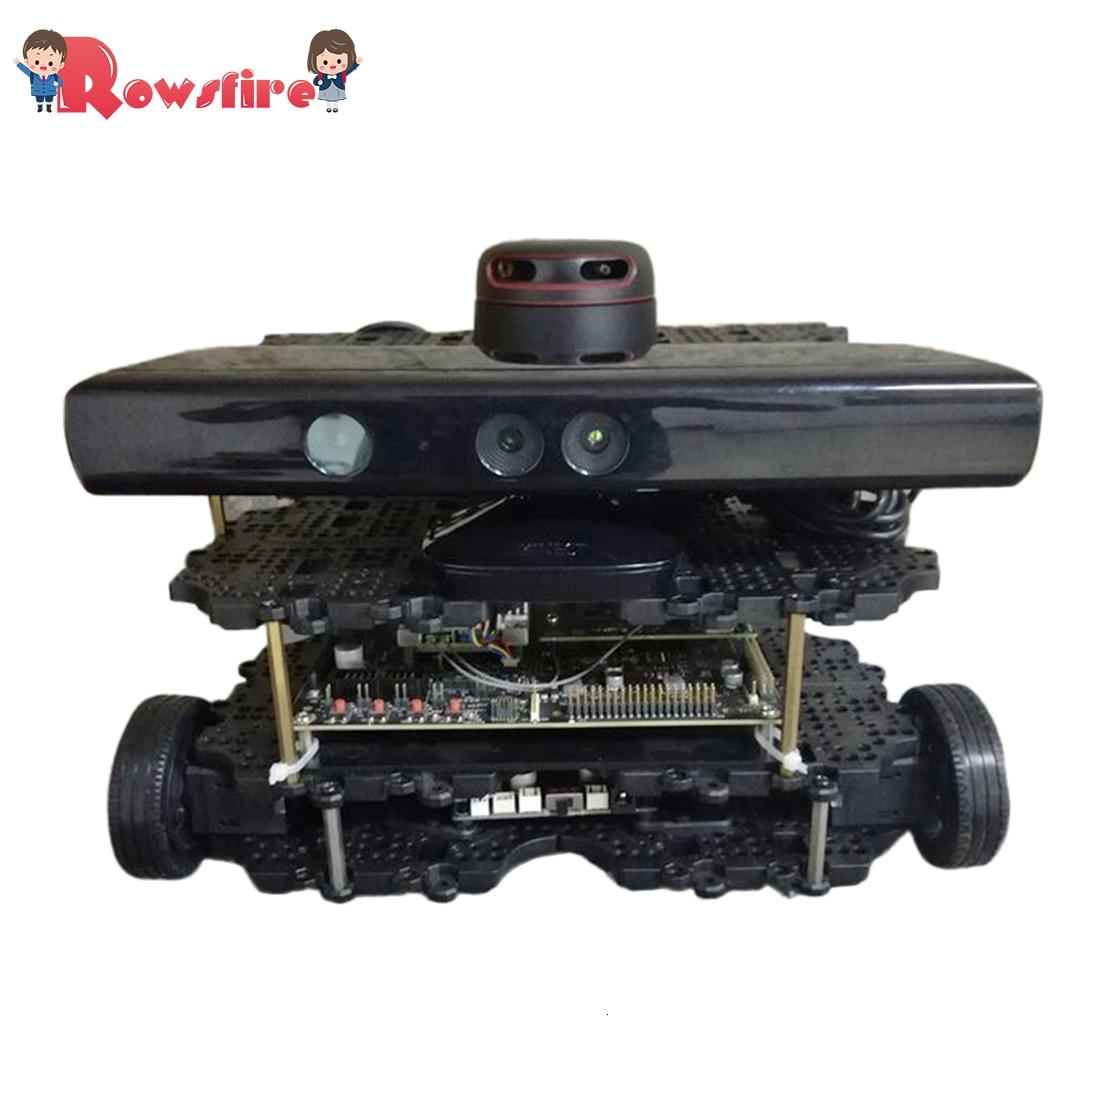 New Arrival Burger Version Robot Operating System Autopilot Robot Car Open Source Kit